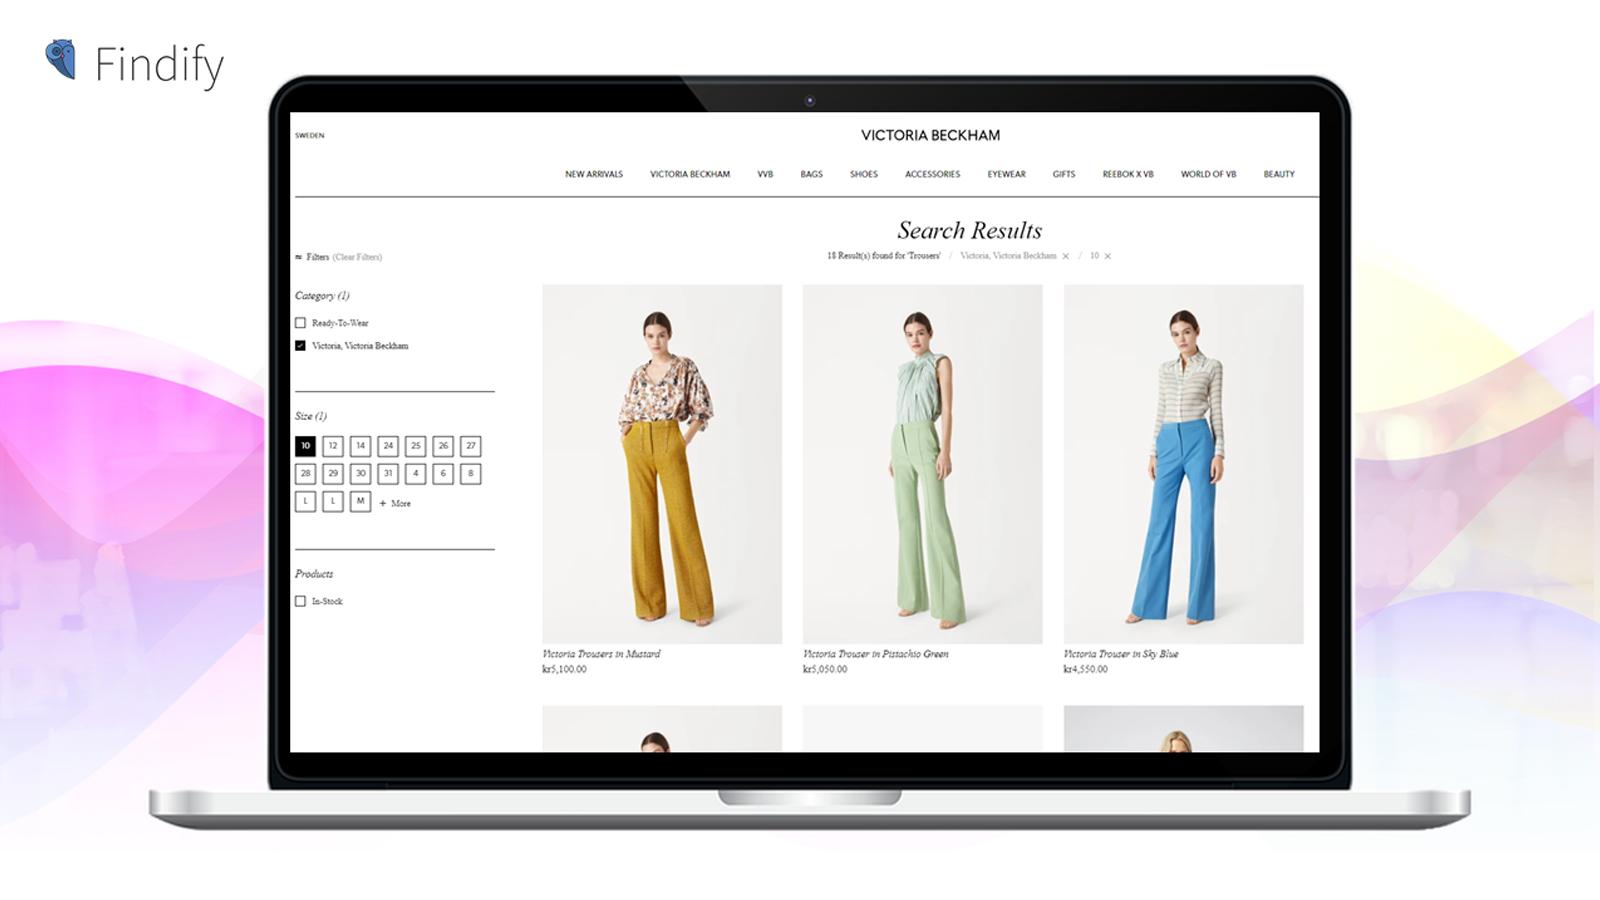 Findify – Search, Personalization & Merchandising